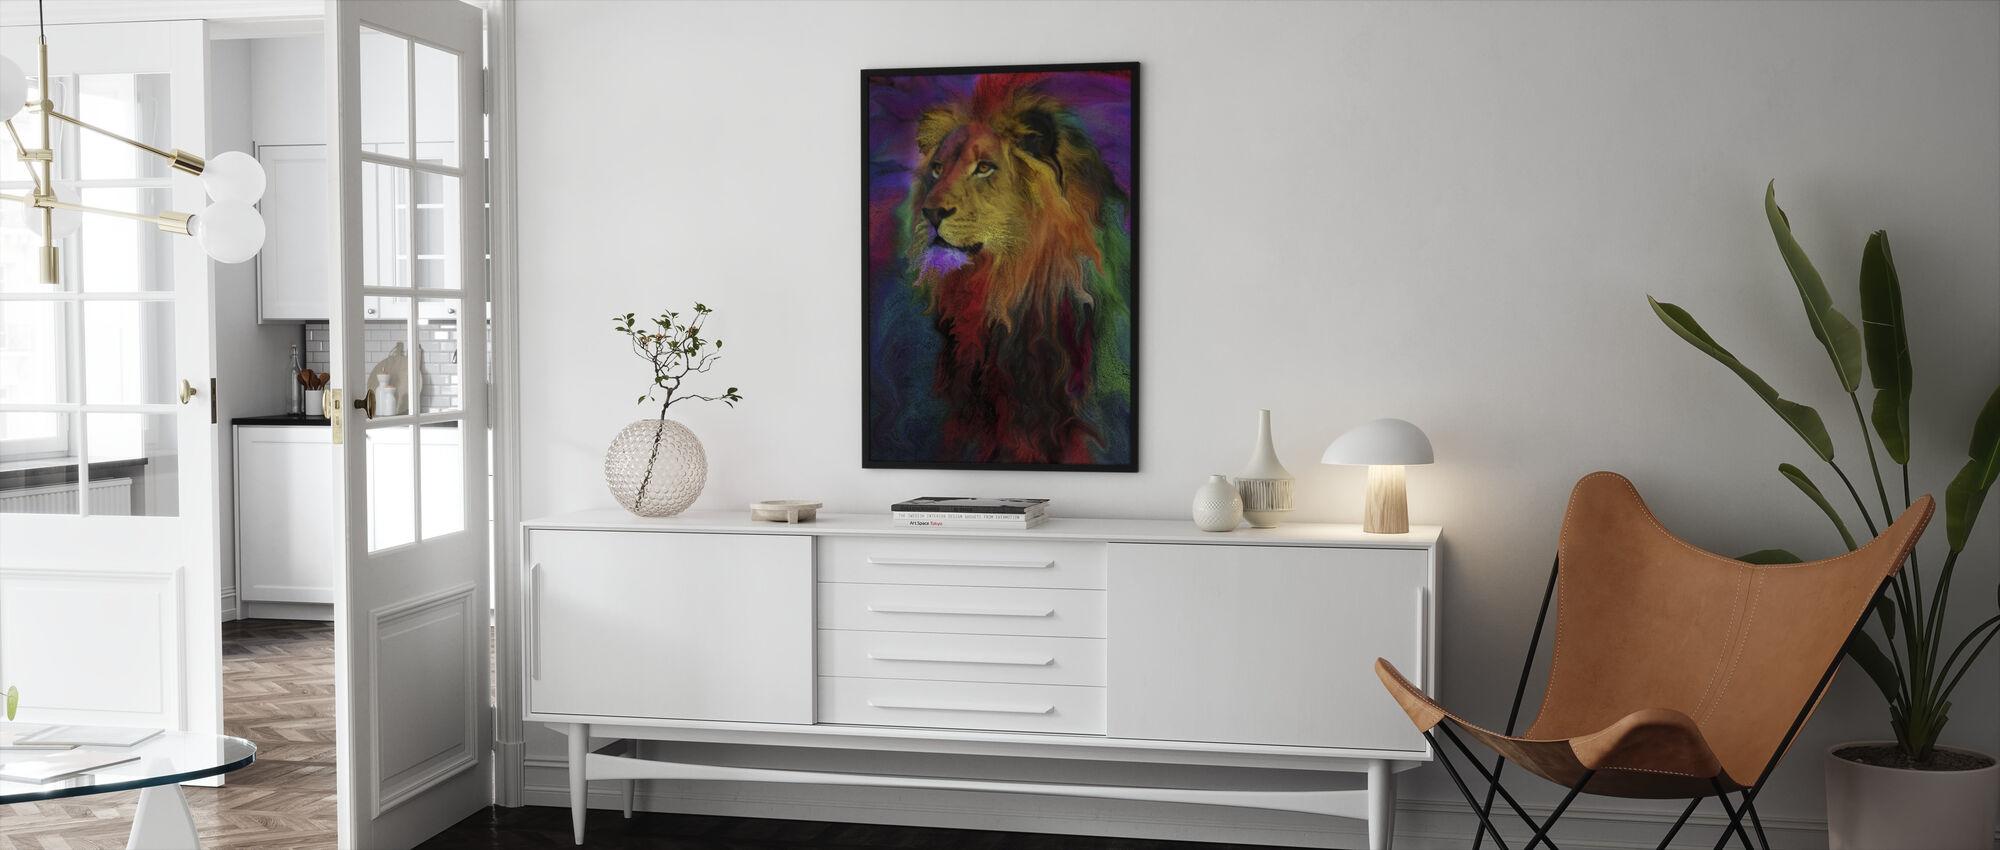 Regnbåge lejon - Inramad tavla - Vardagsrum